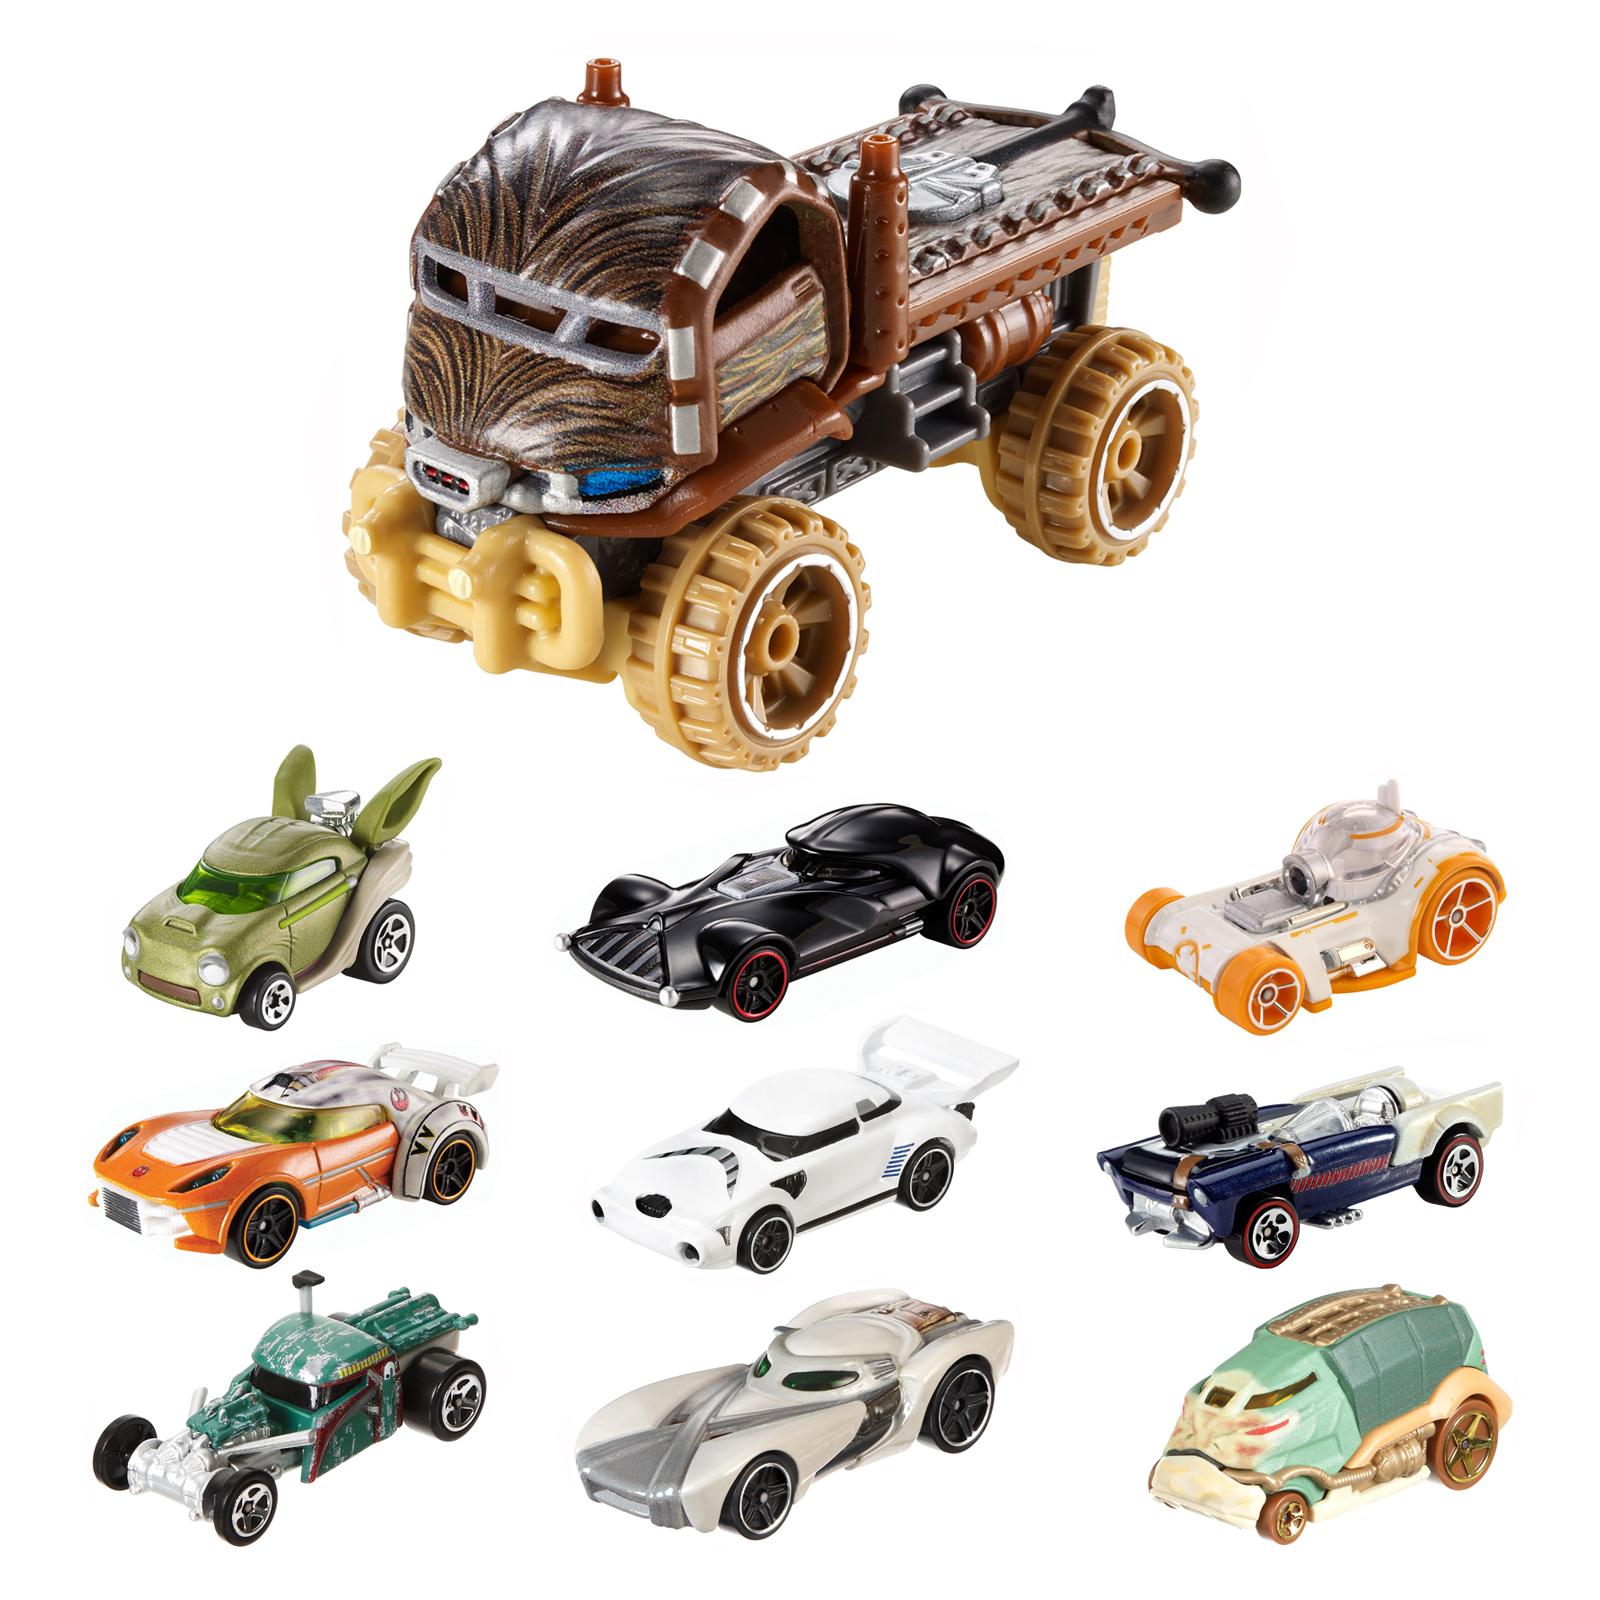 Star Wars Characters Toys : Hot wheels disney star wars die cast character car vehicle